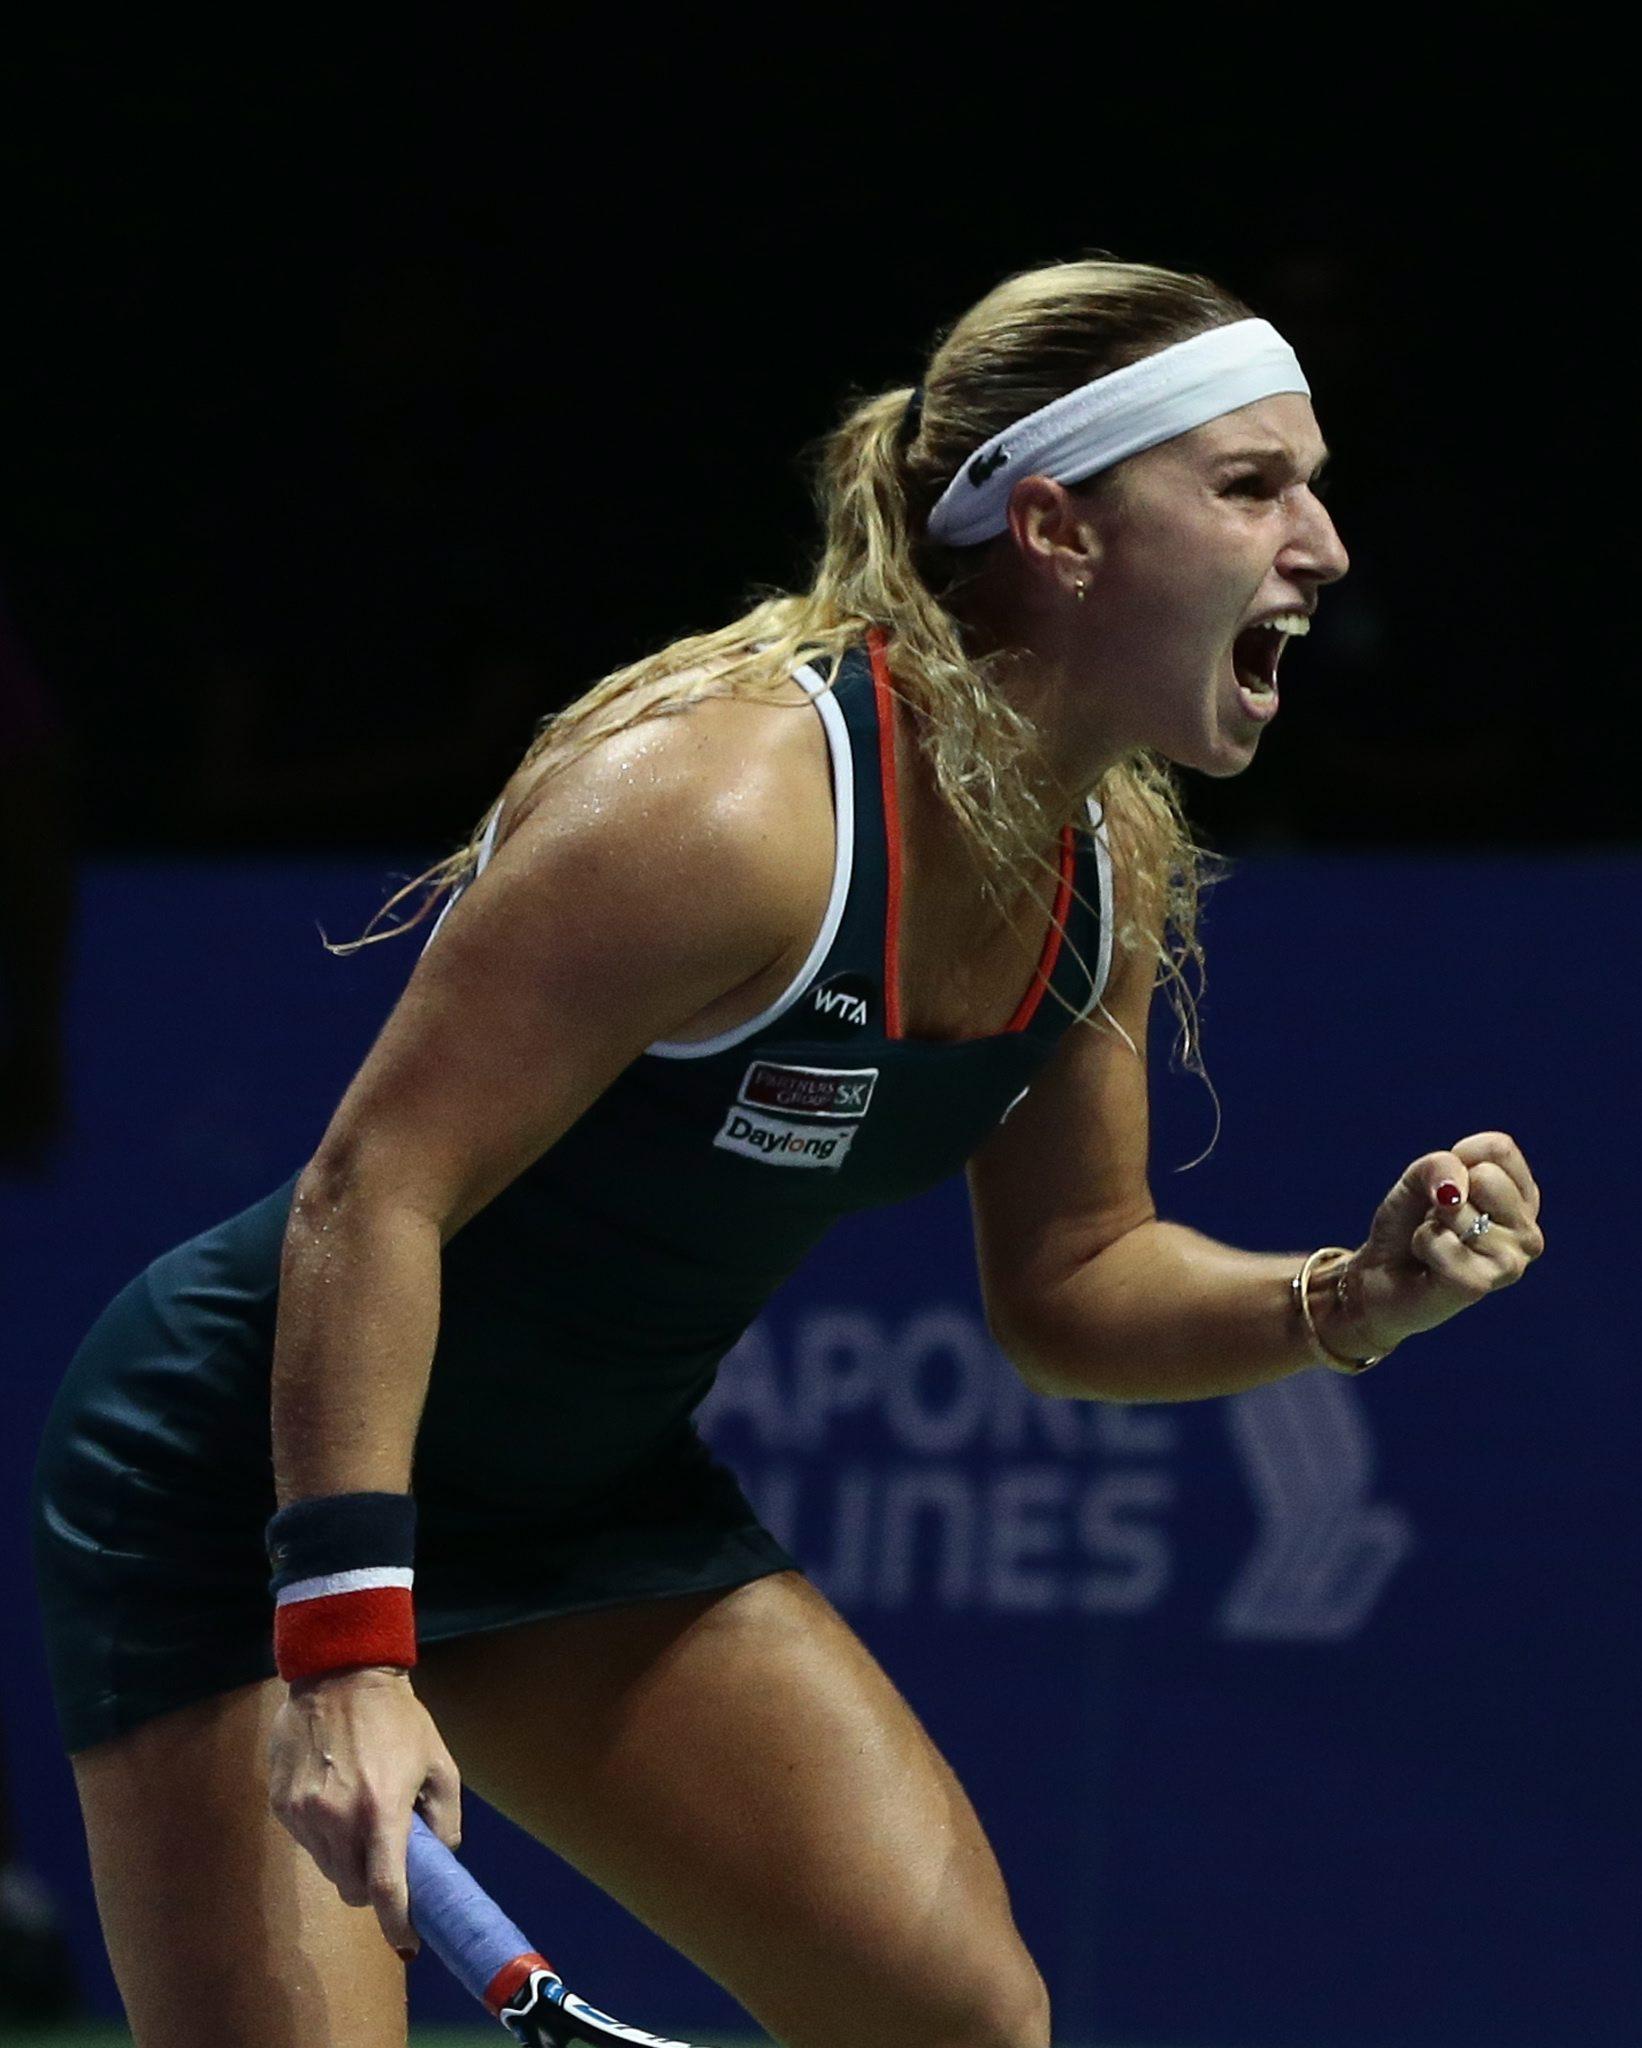 Mistrzostwa WTA: Dominika Cibulkova wciąż ma szanse na